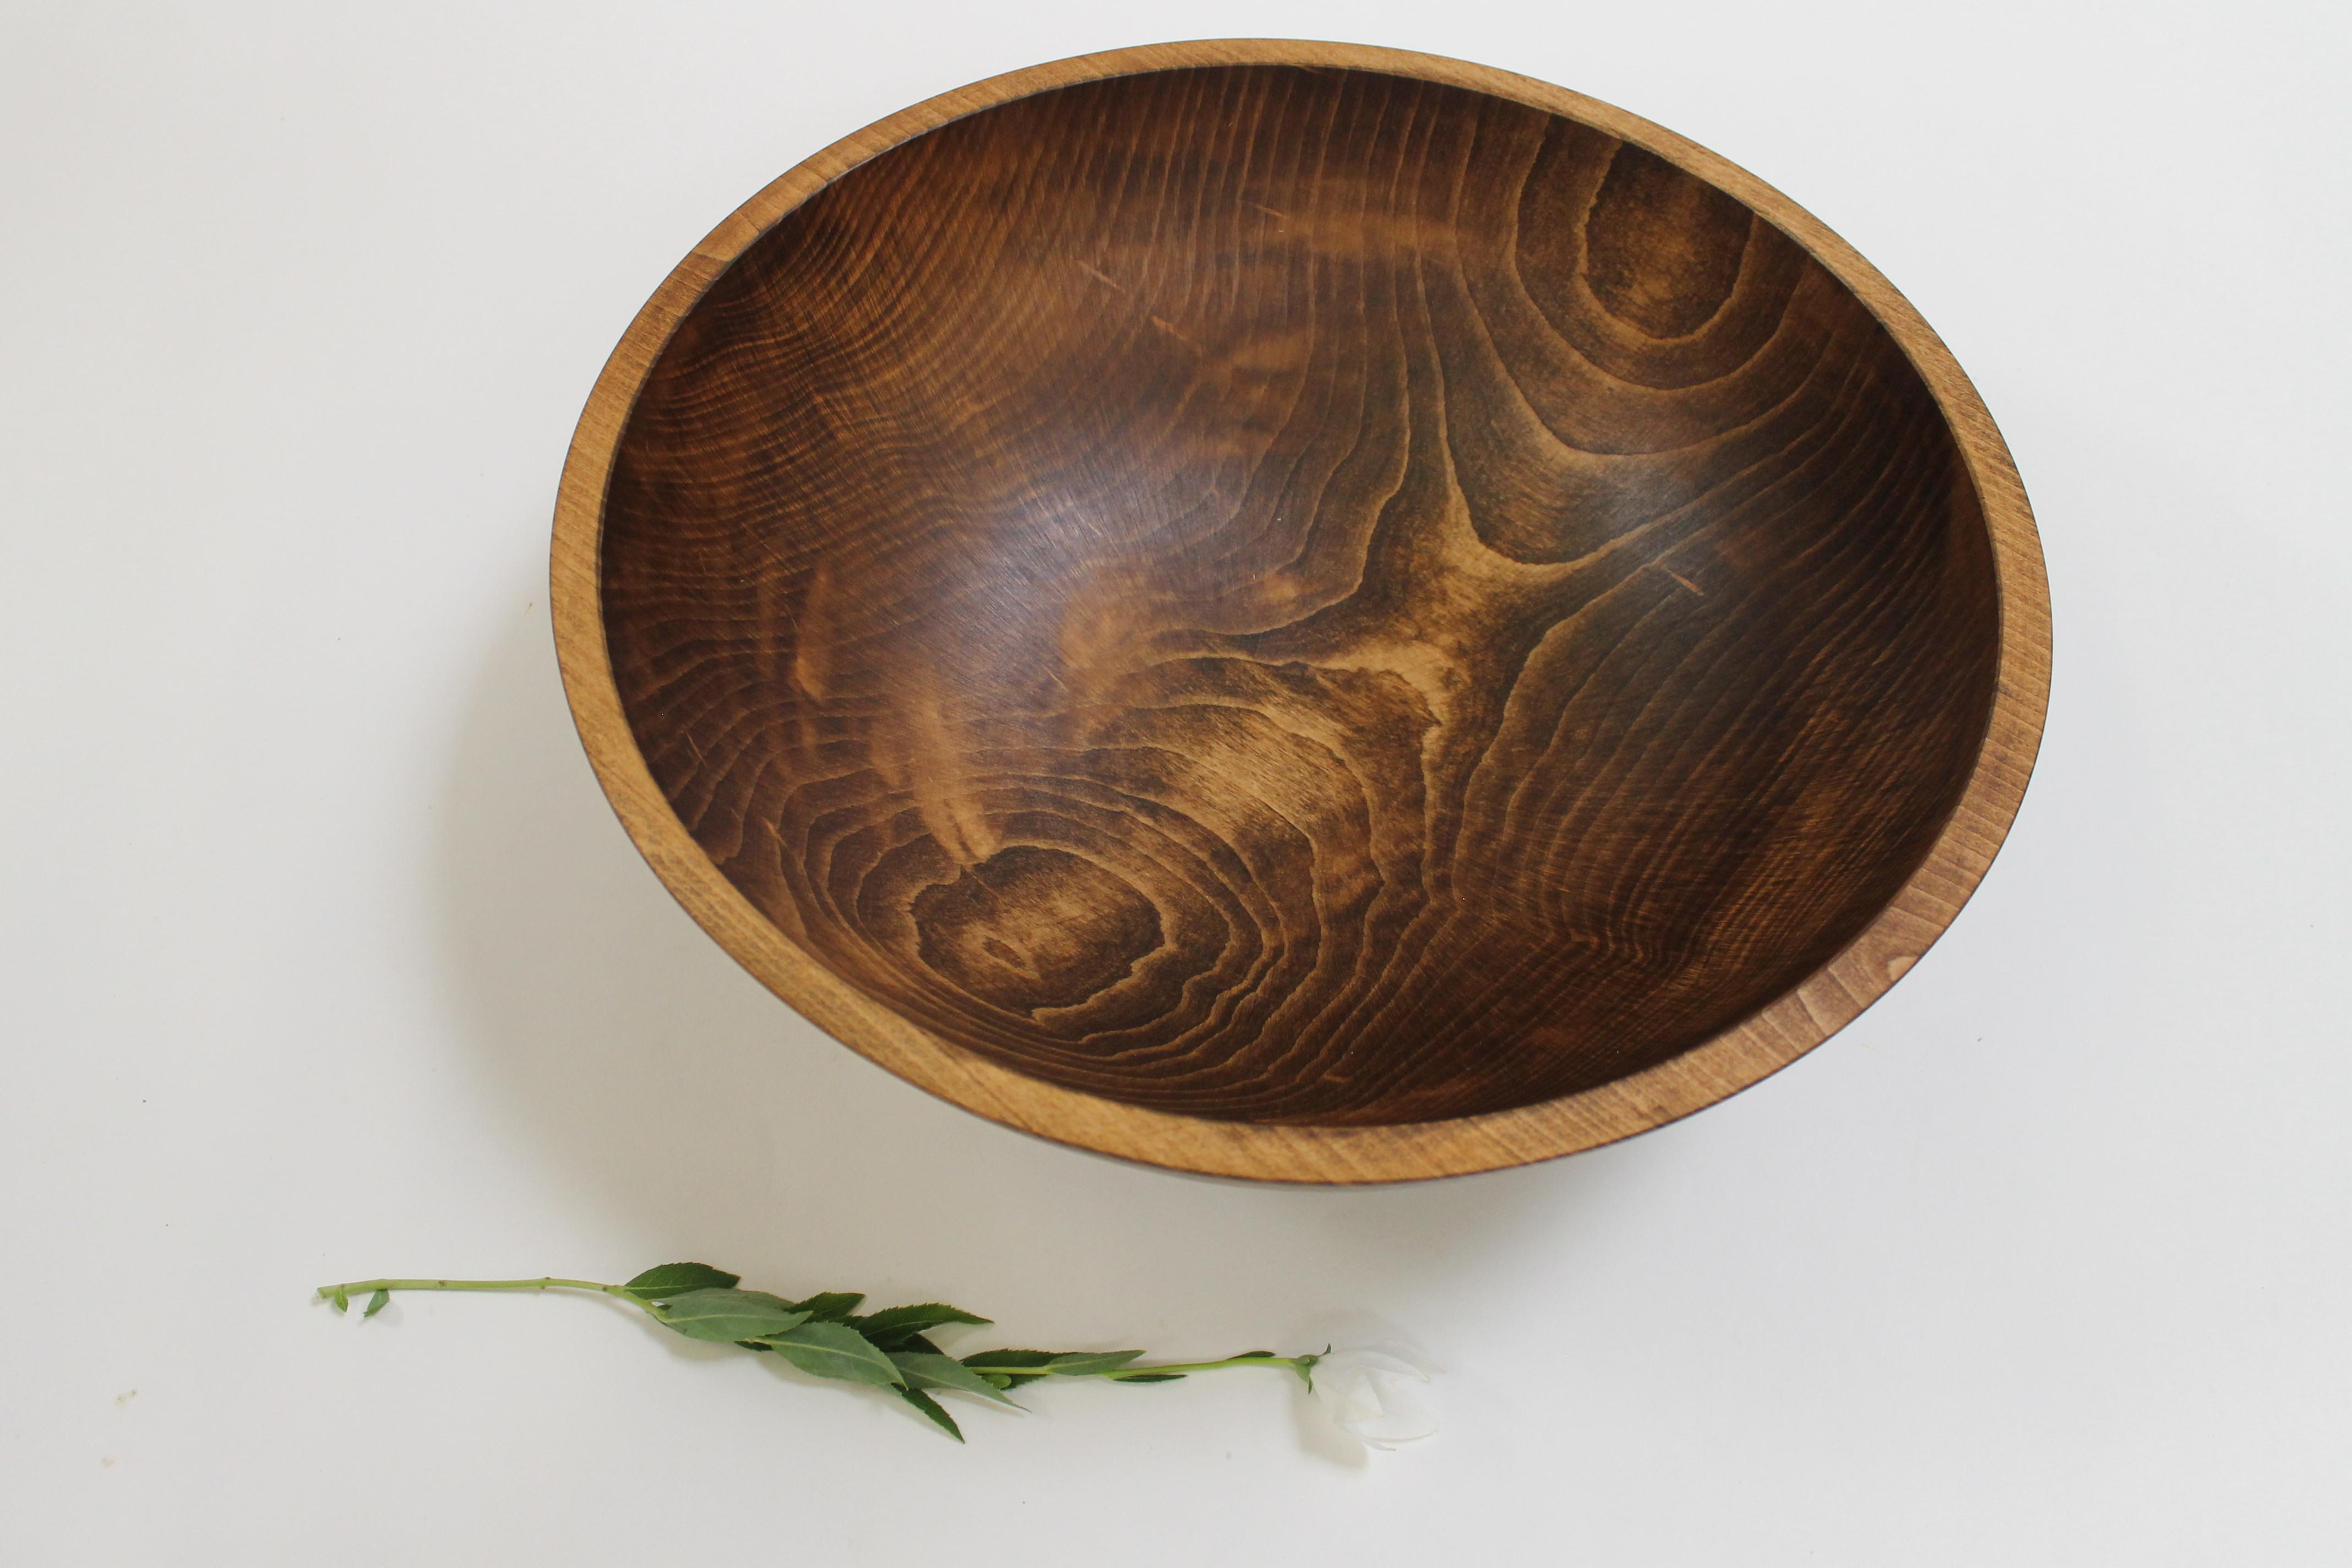 17 inch Beech Bowl - Dark Walnut & Bee's Oil Finish 117WBDK